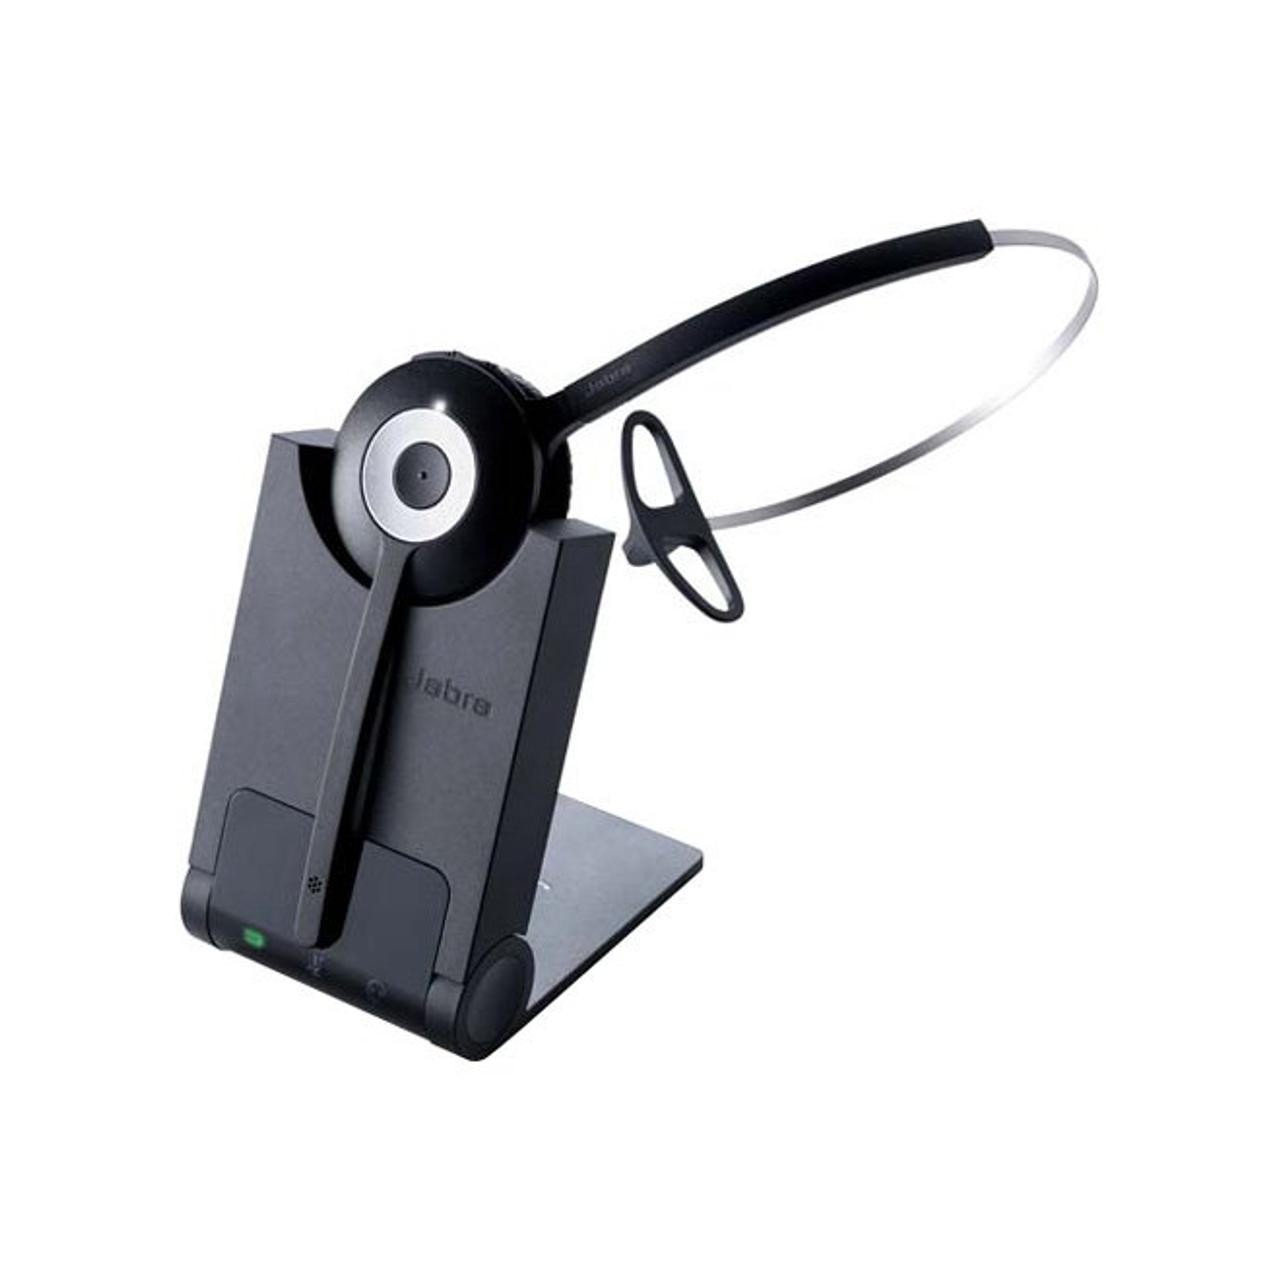 Wireless Headset for Sangoma S500 IP Phone PRO920